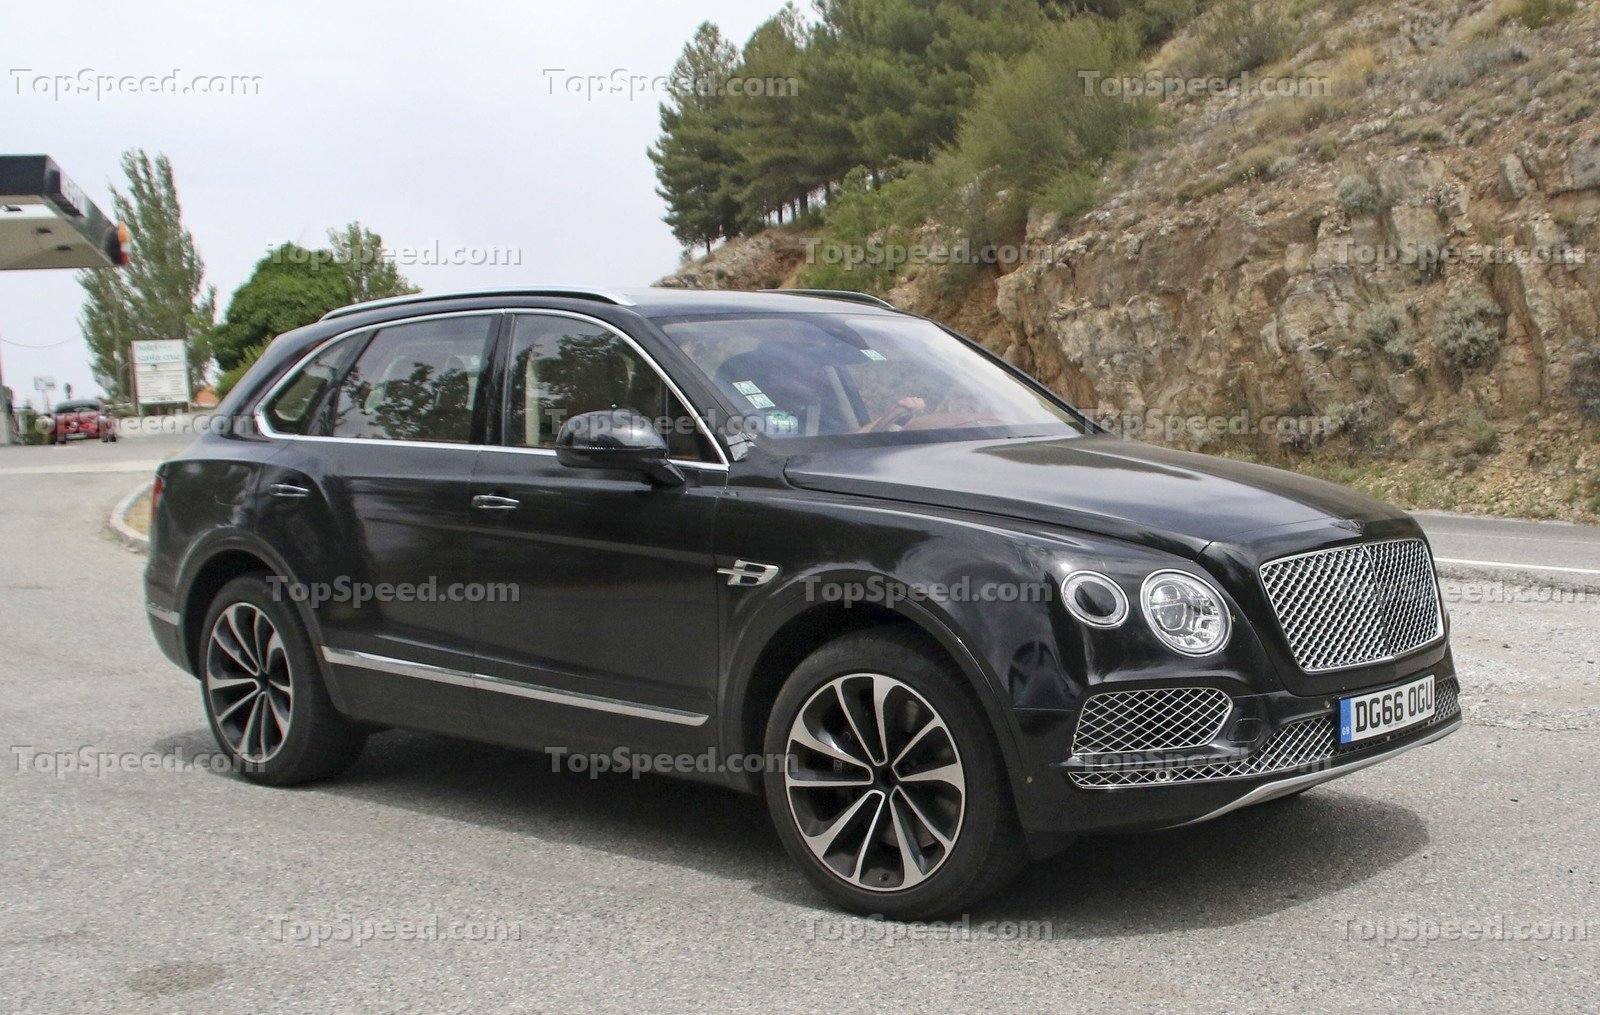 2019 Bentley Bentayga Price Inside The Cabin Design Engine